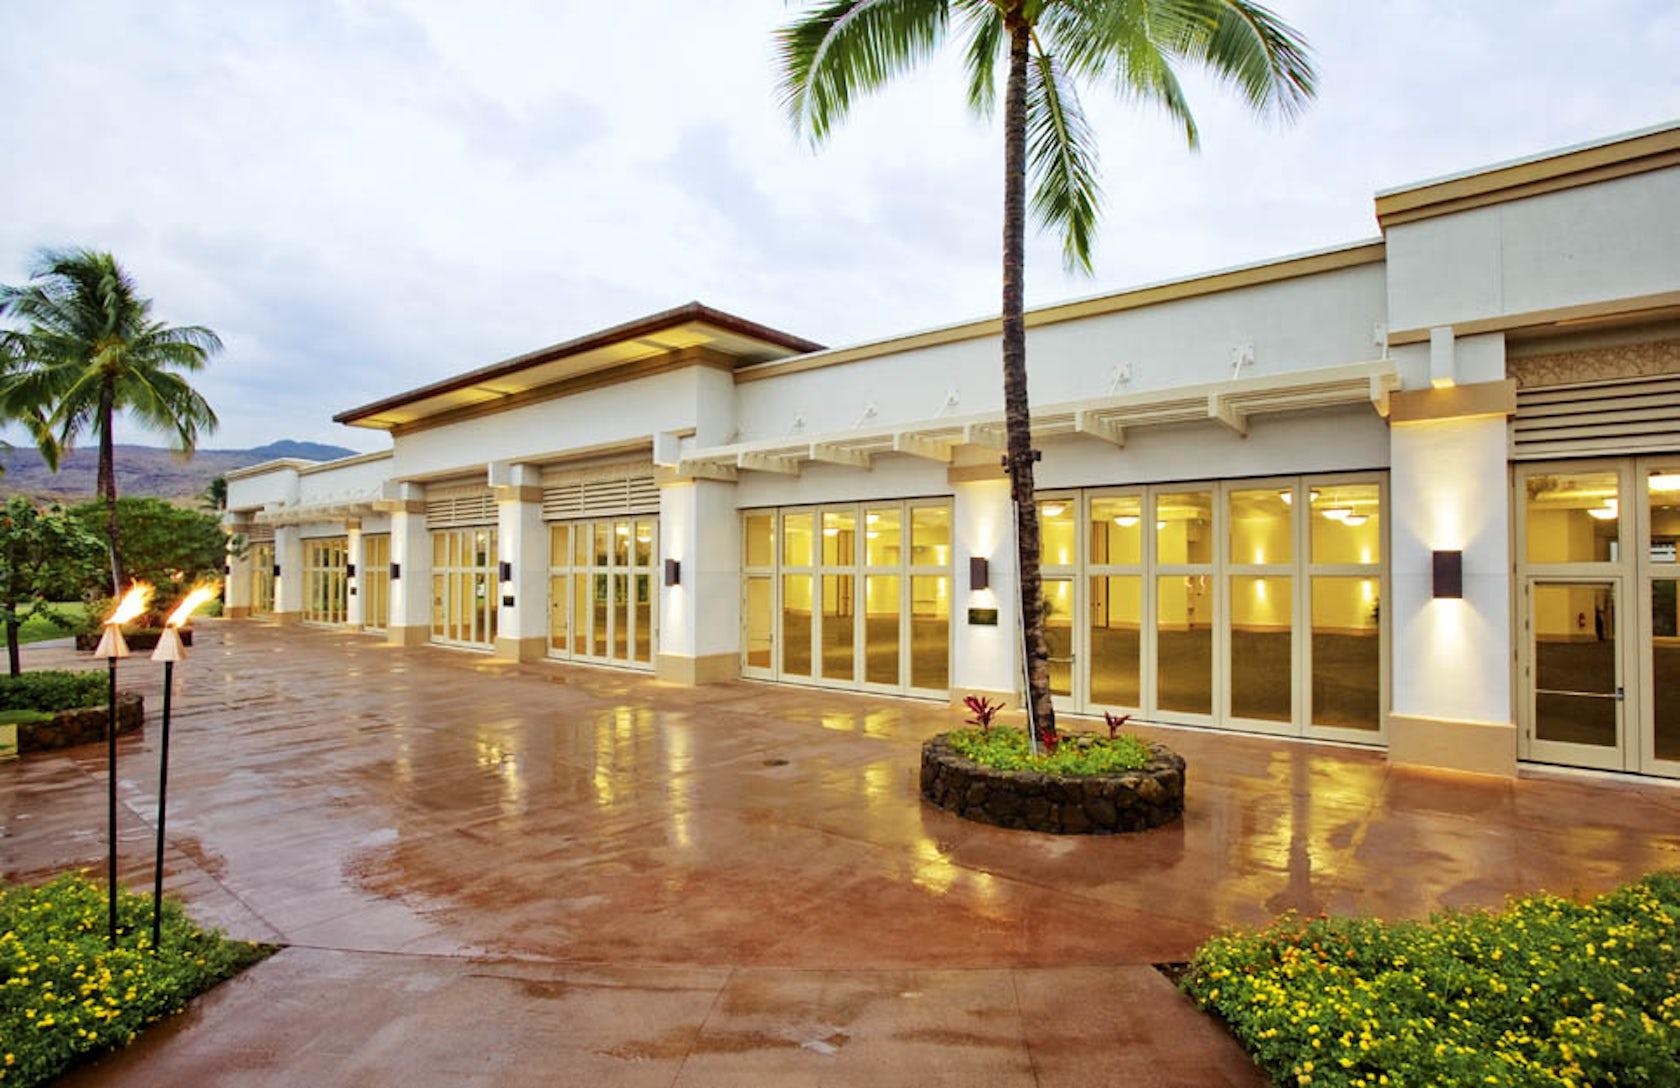 Hokulani Ballroom Jw Marriott Resort Spa Architizer